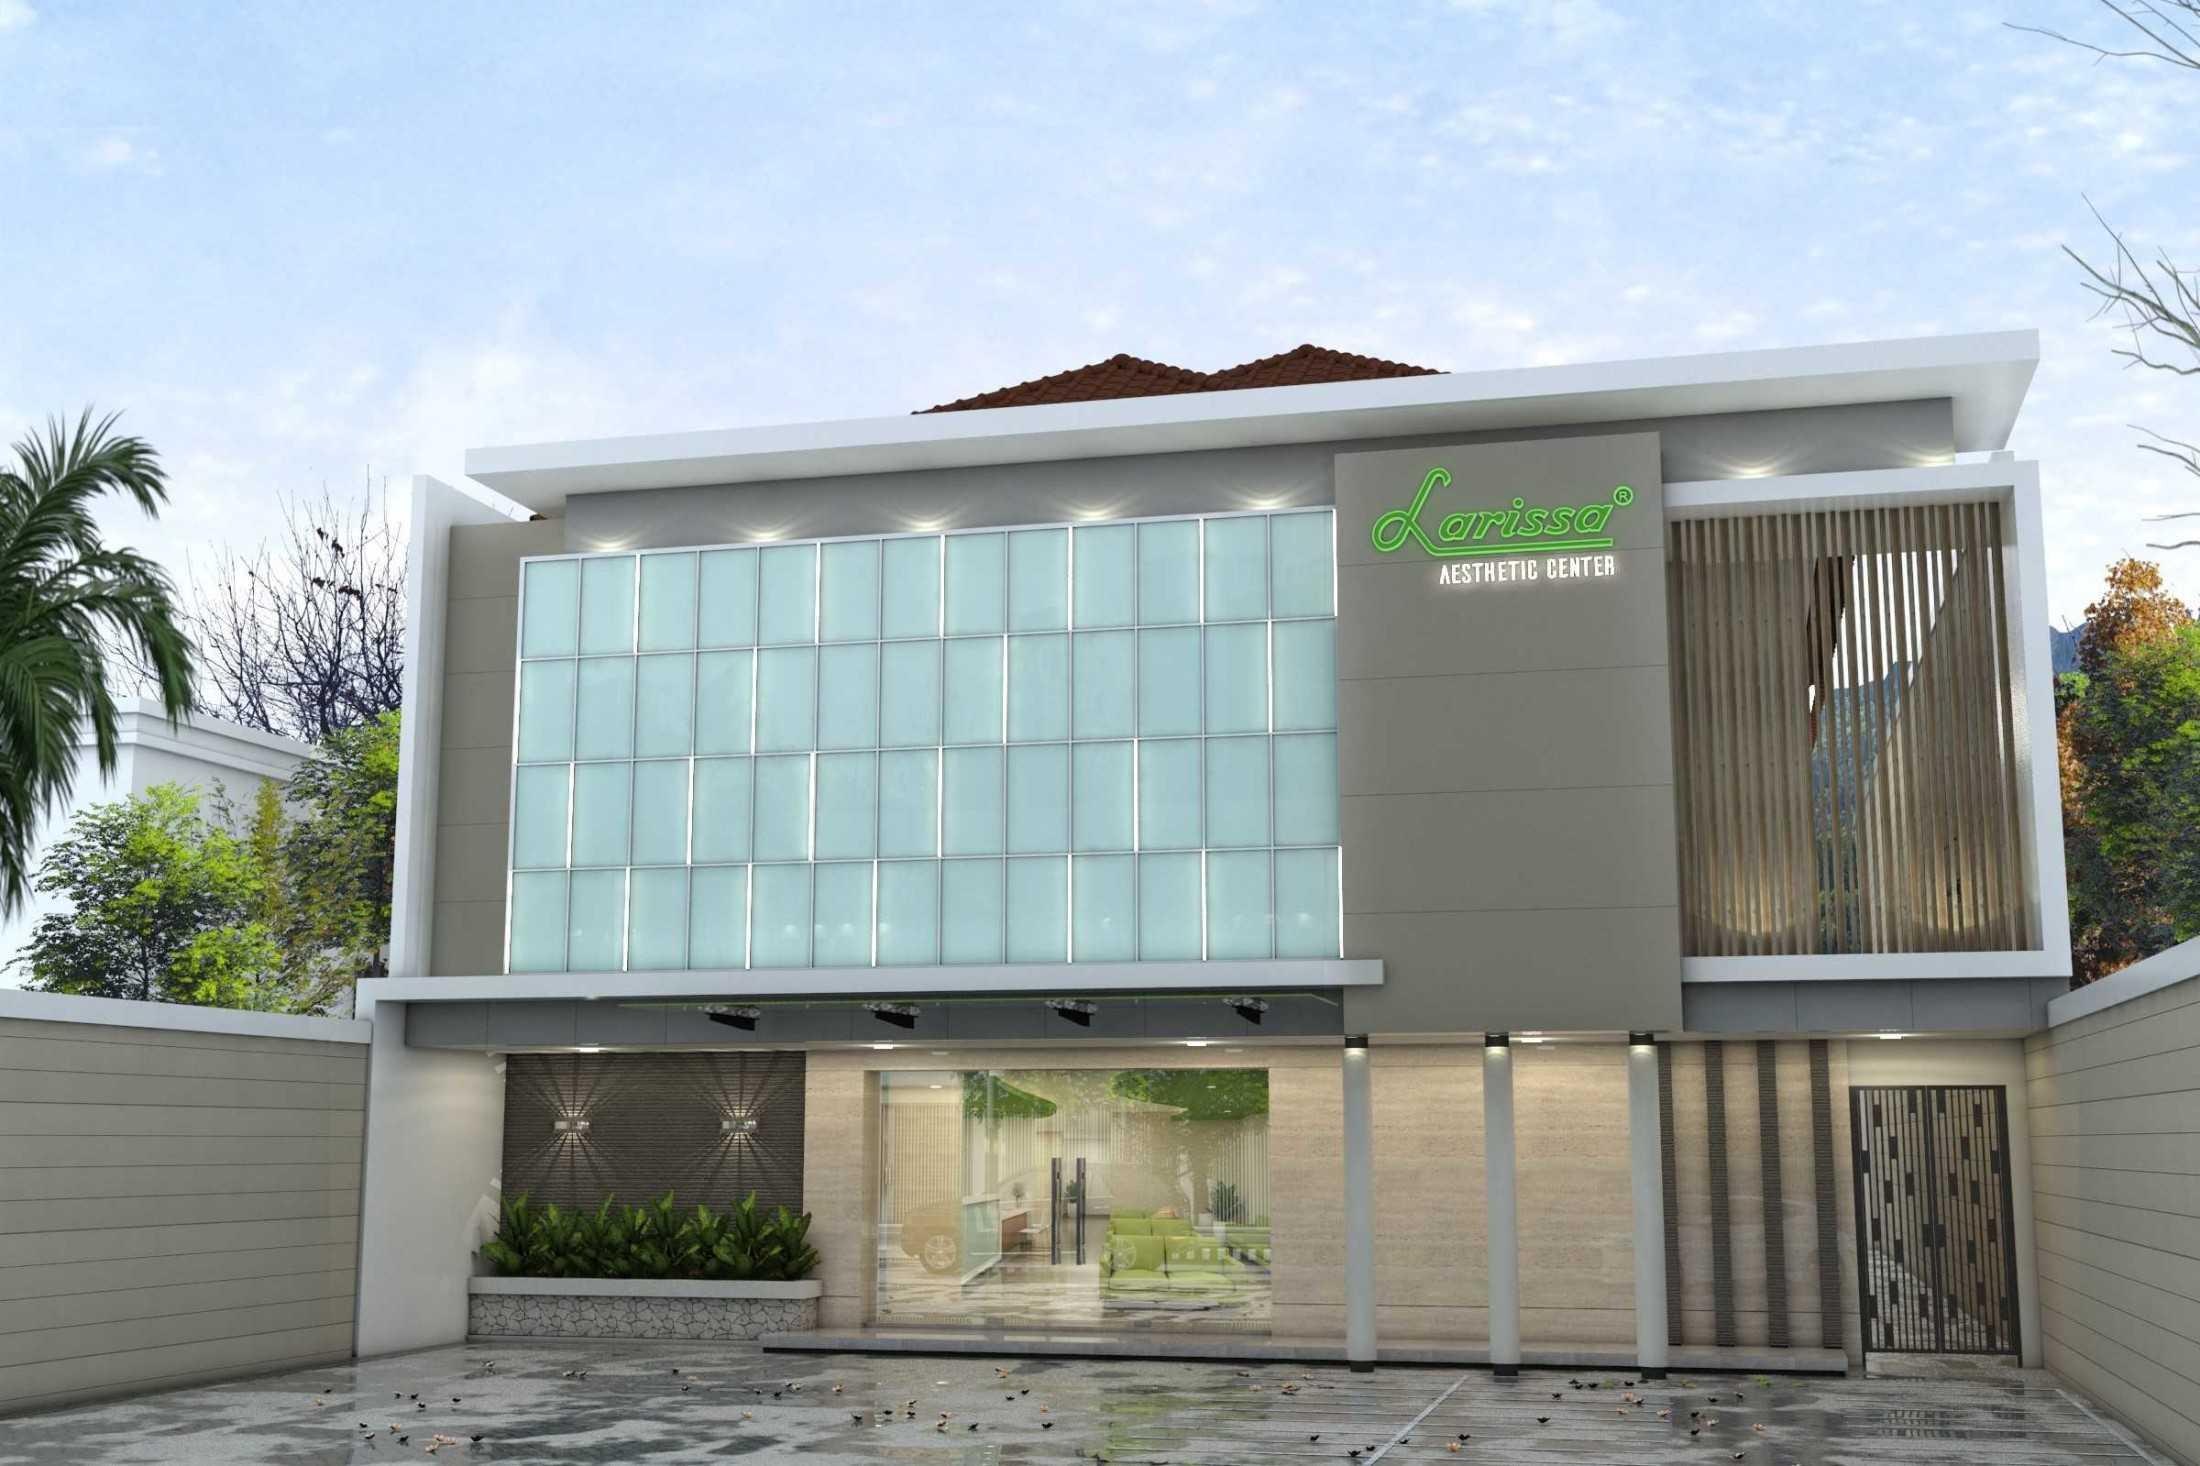 Conarch Studio Larissa Aesthetic Center Surabaya Surabaya, Kota Sby, Jawa Timur, Indonesia Surabaya, Kota Sby, Jawa Timur, Indonesia Conarch-Bangun-Sejahtera-Larissa-Aesthetic-Center-Surabaya  82277